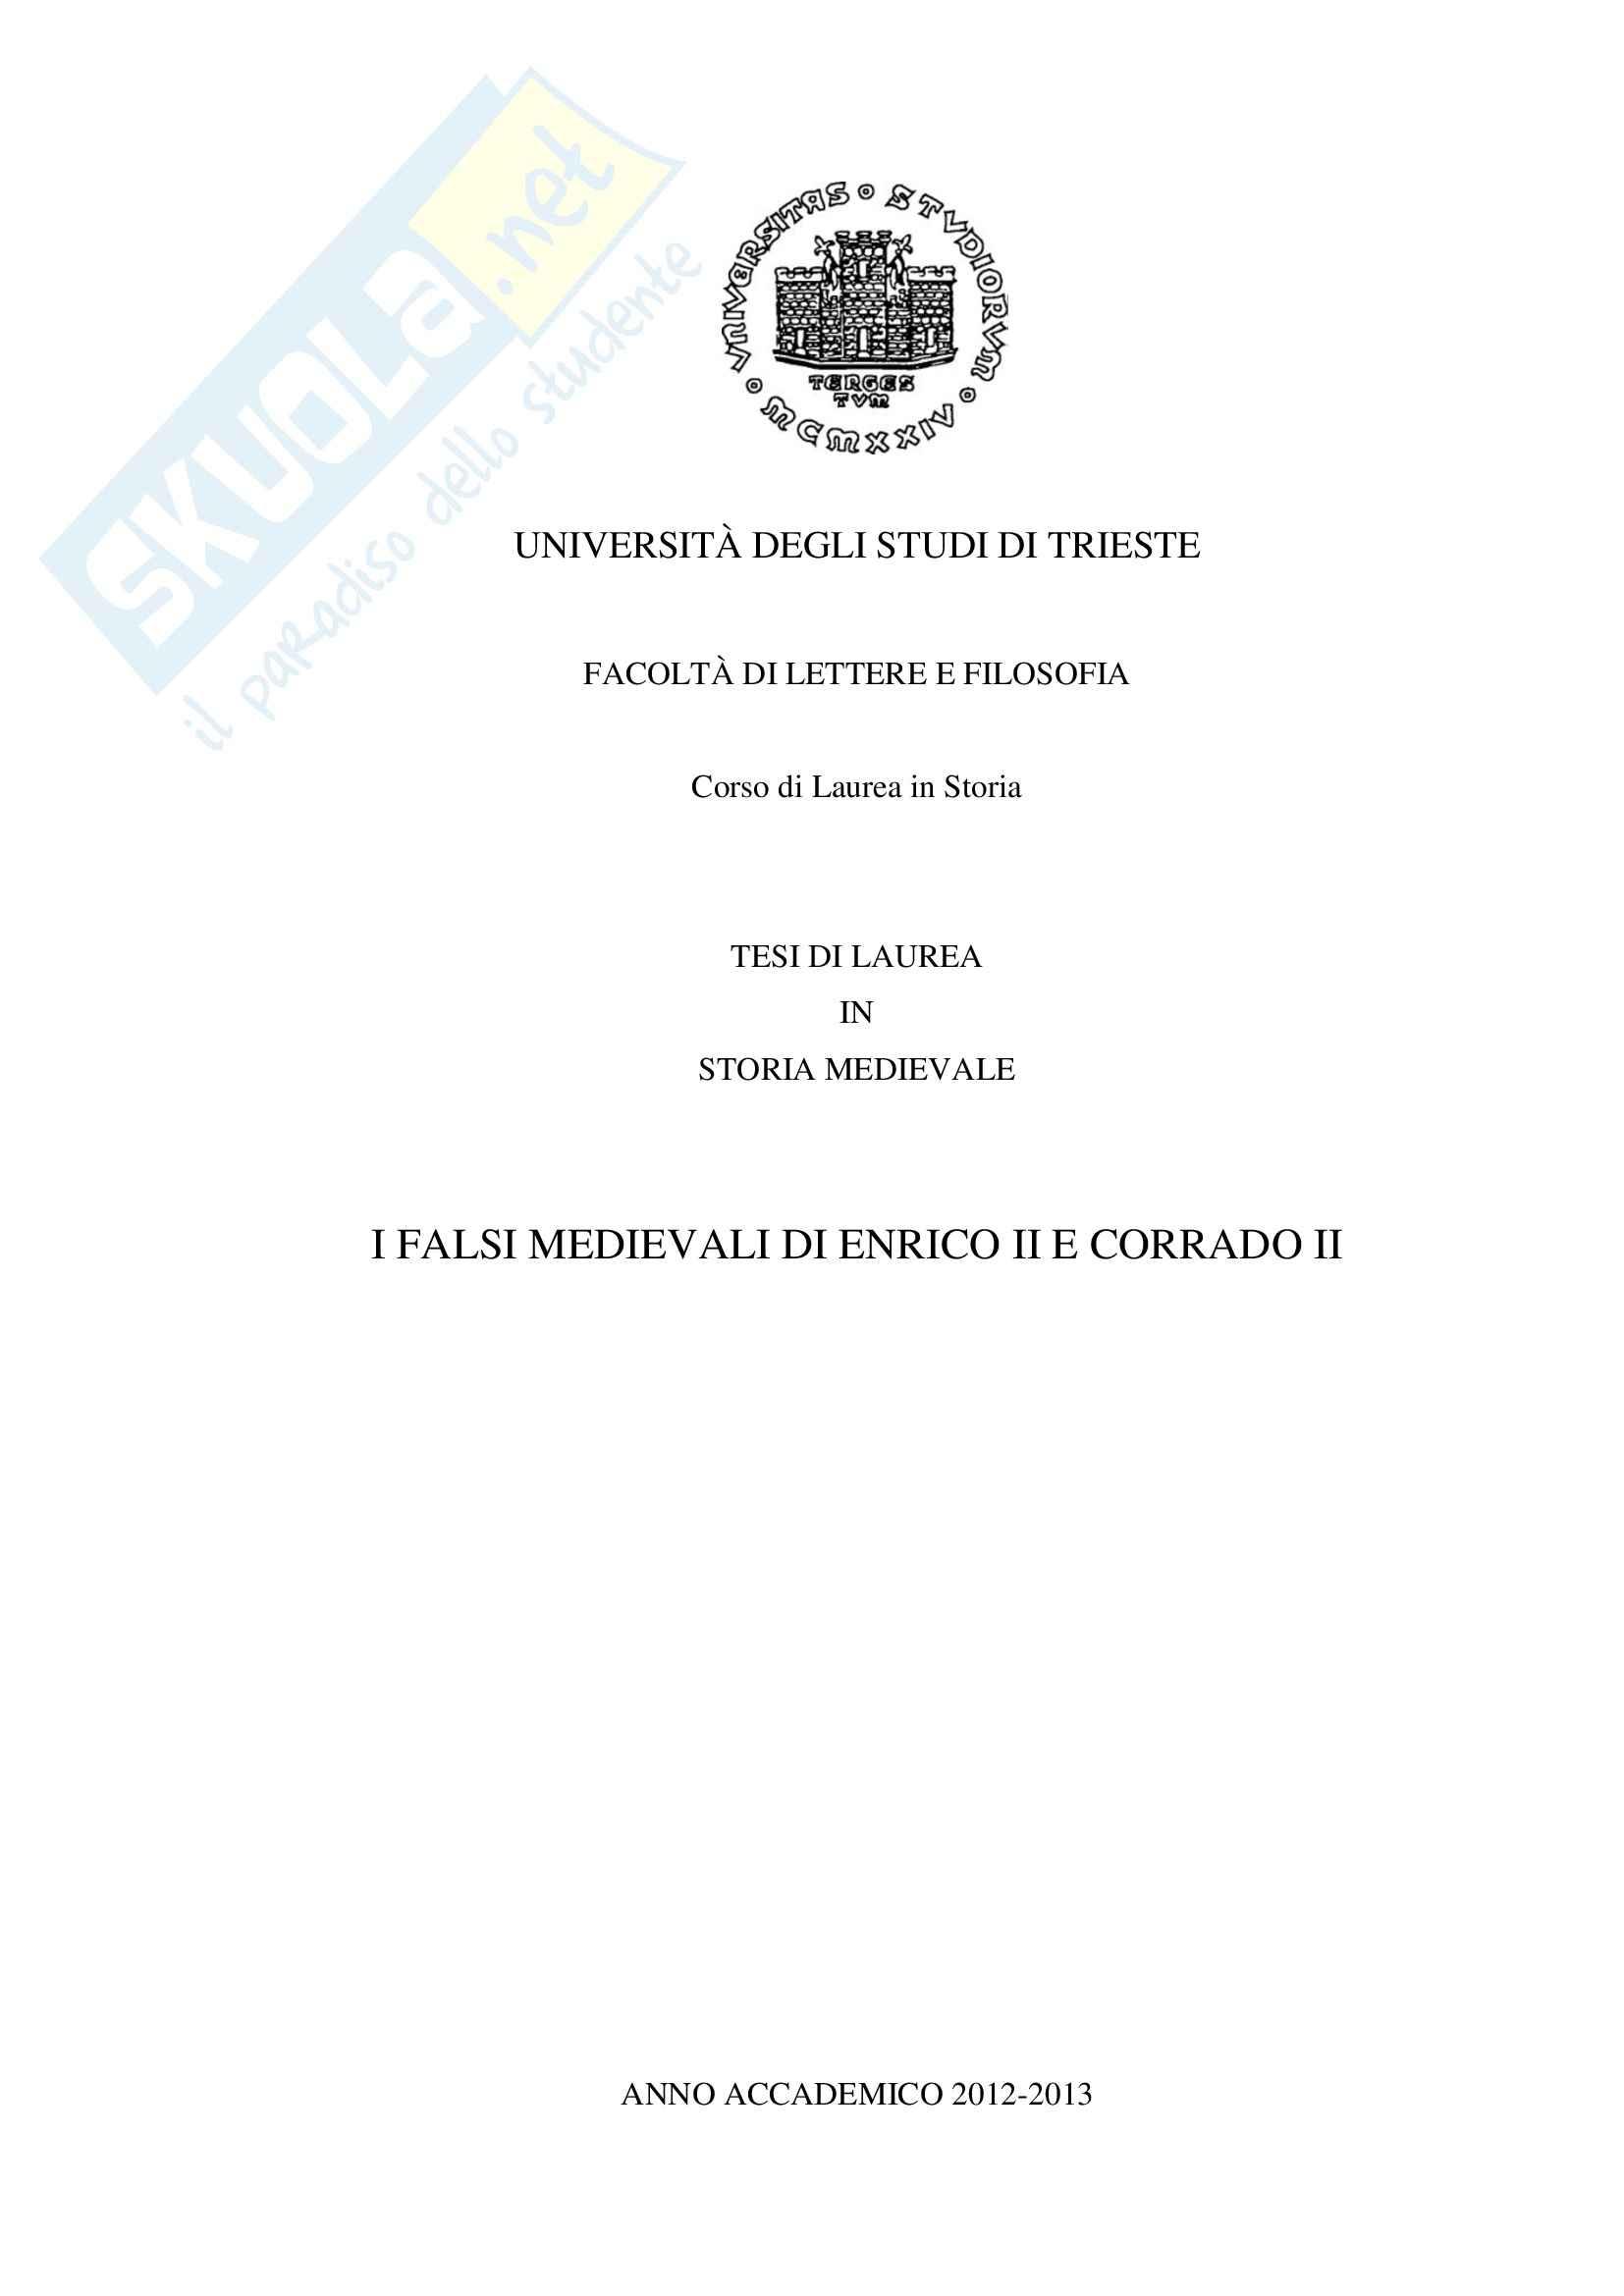 Tesi - Falsi Medievali di Enrico II e Corrado II